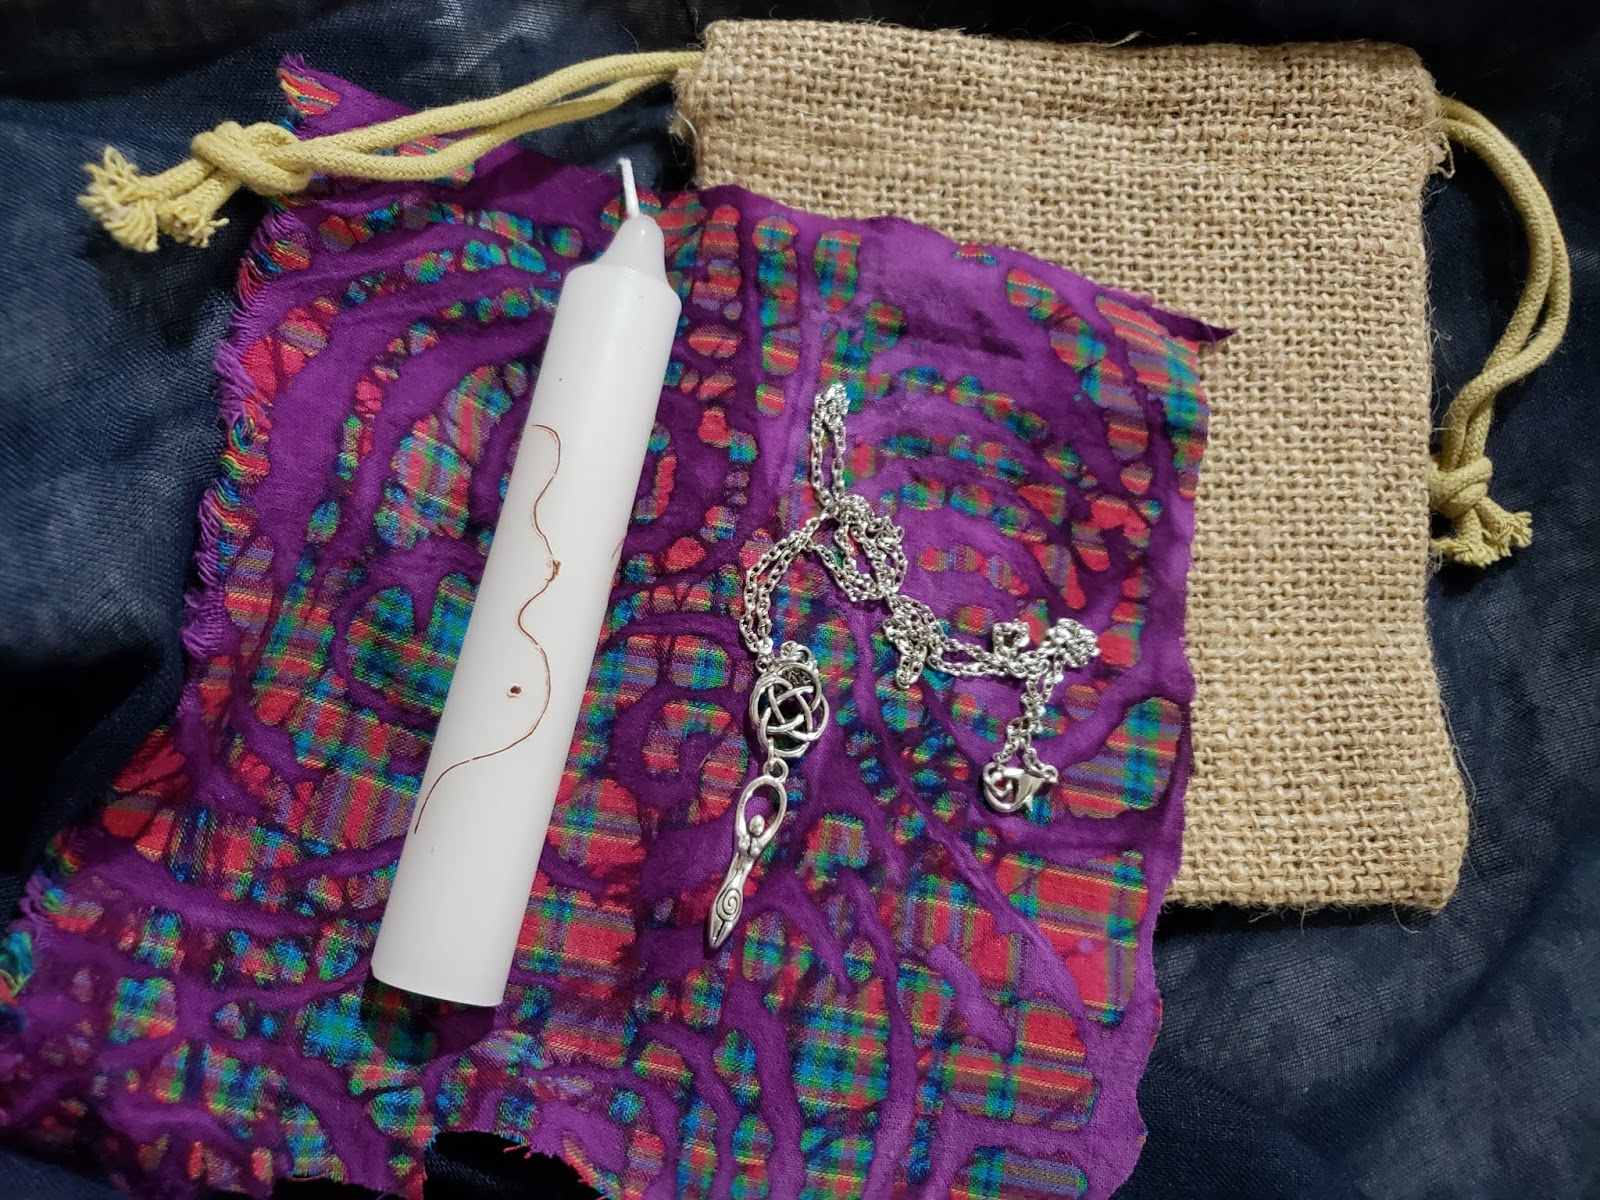 Spiritual Mothering: My latest Etsy sale